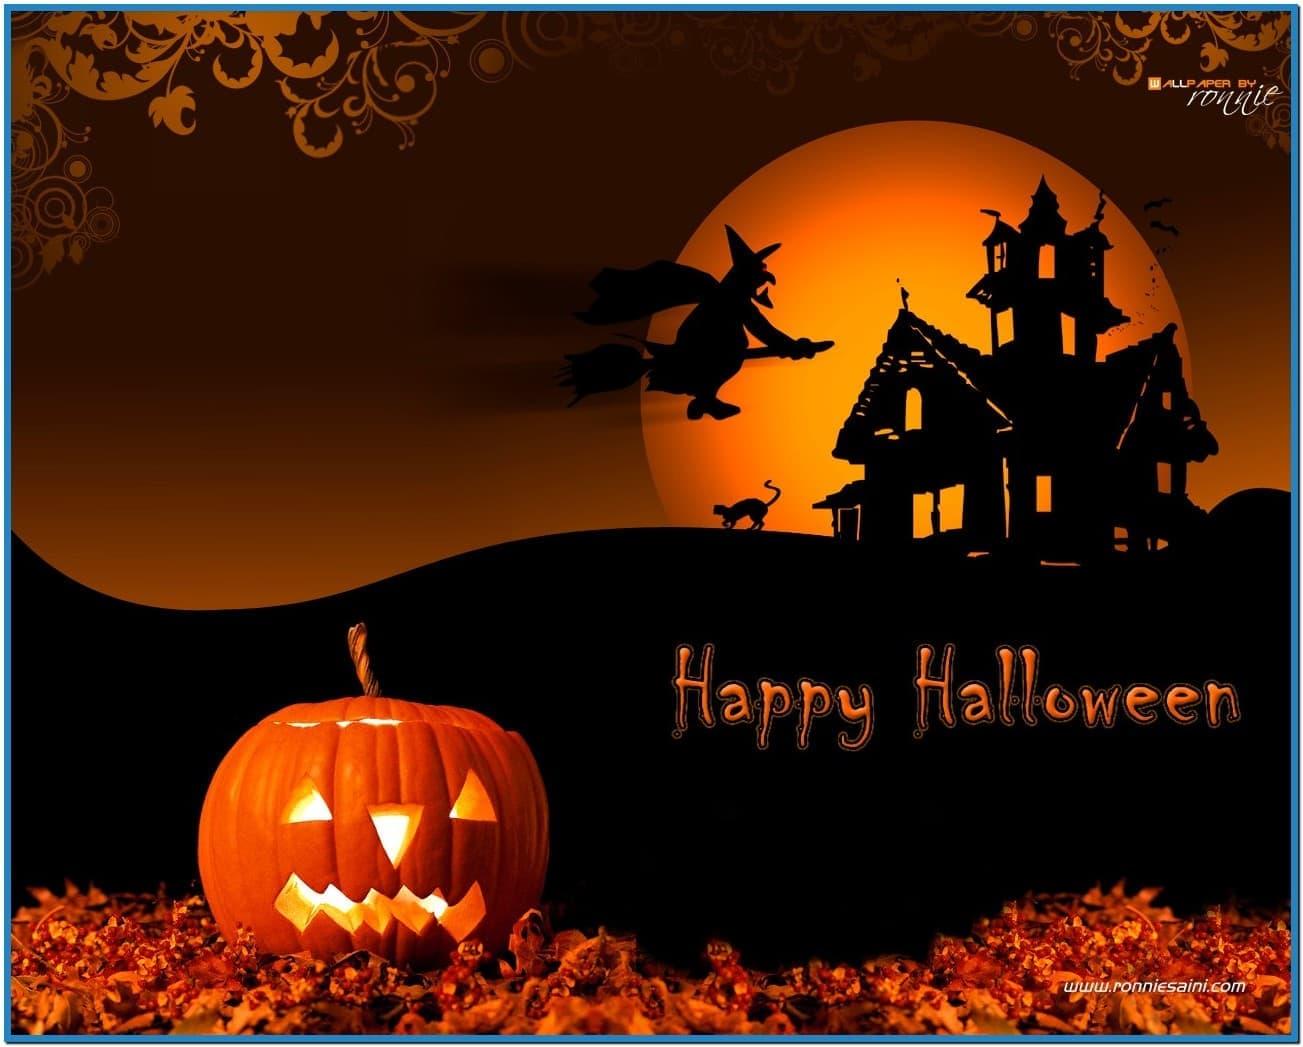 Halloween wallpaper screensavers 1303x1047